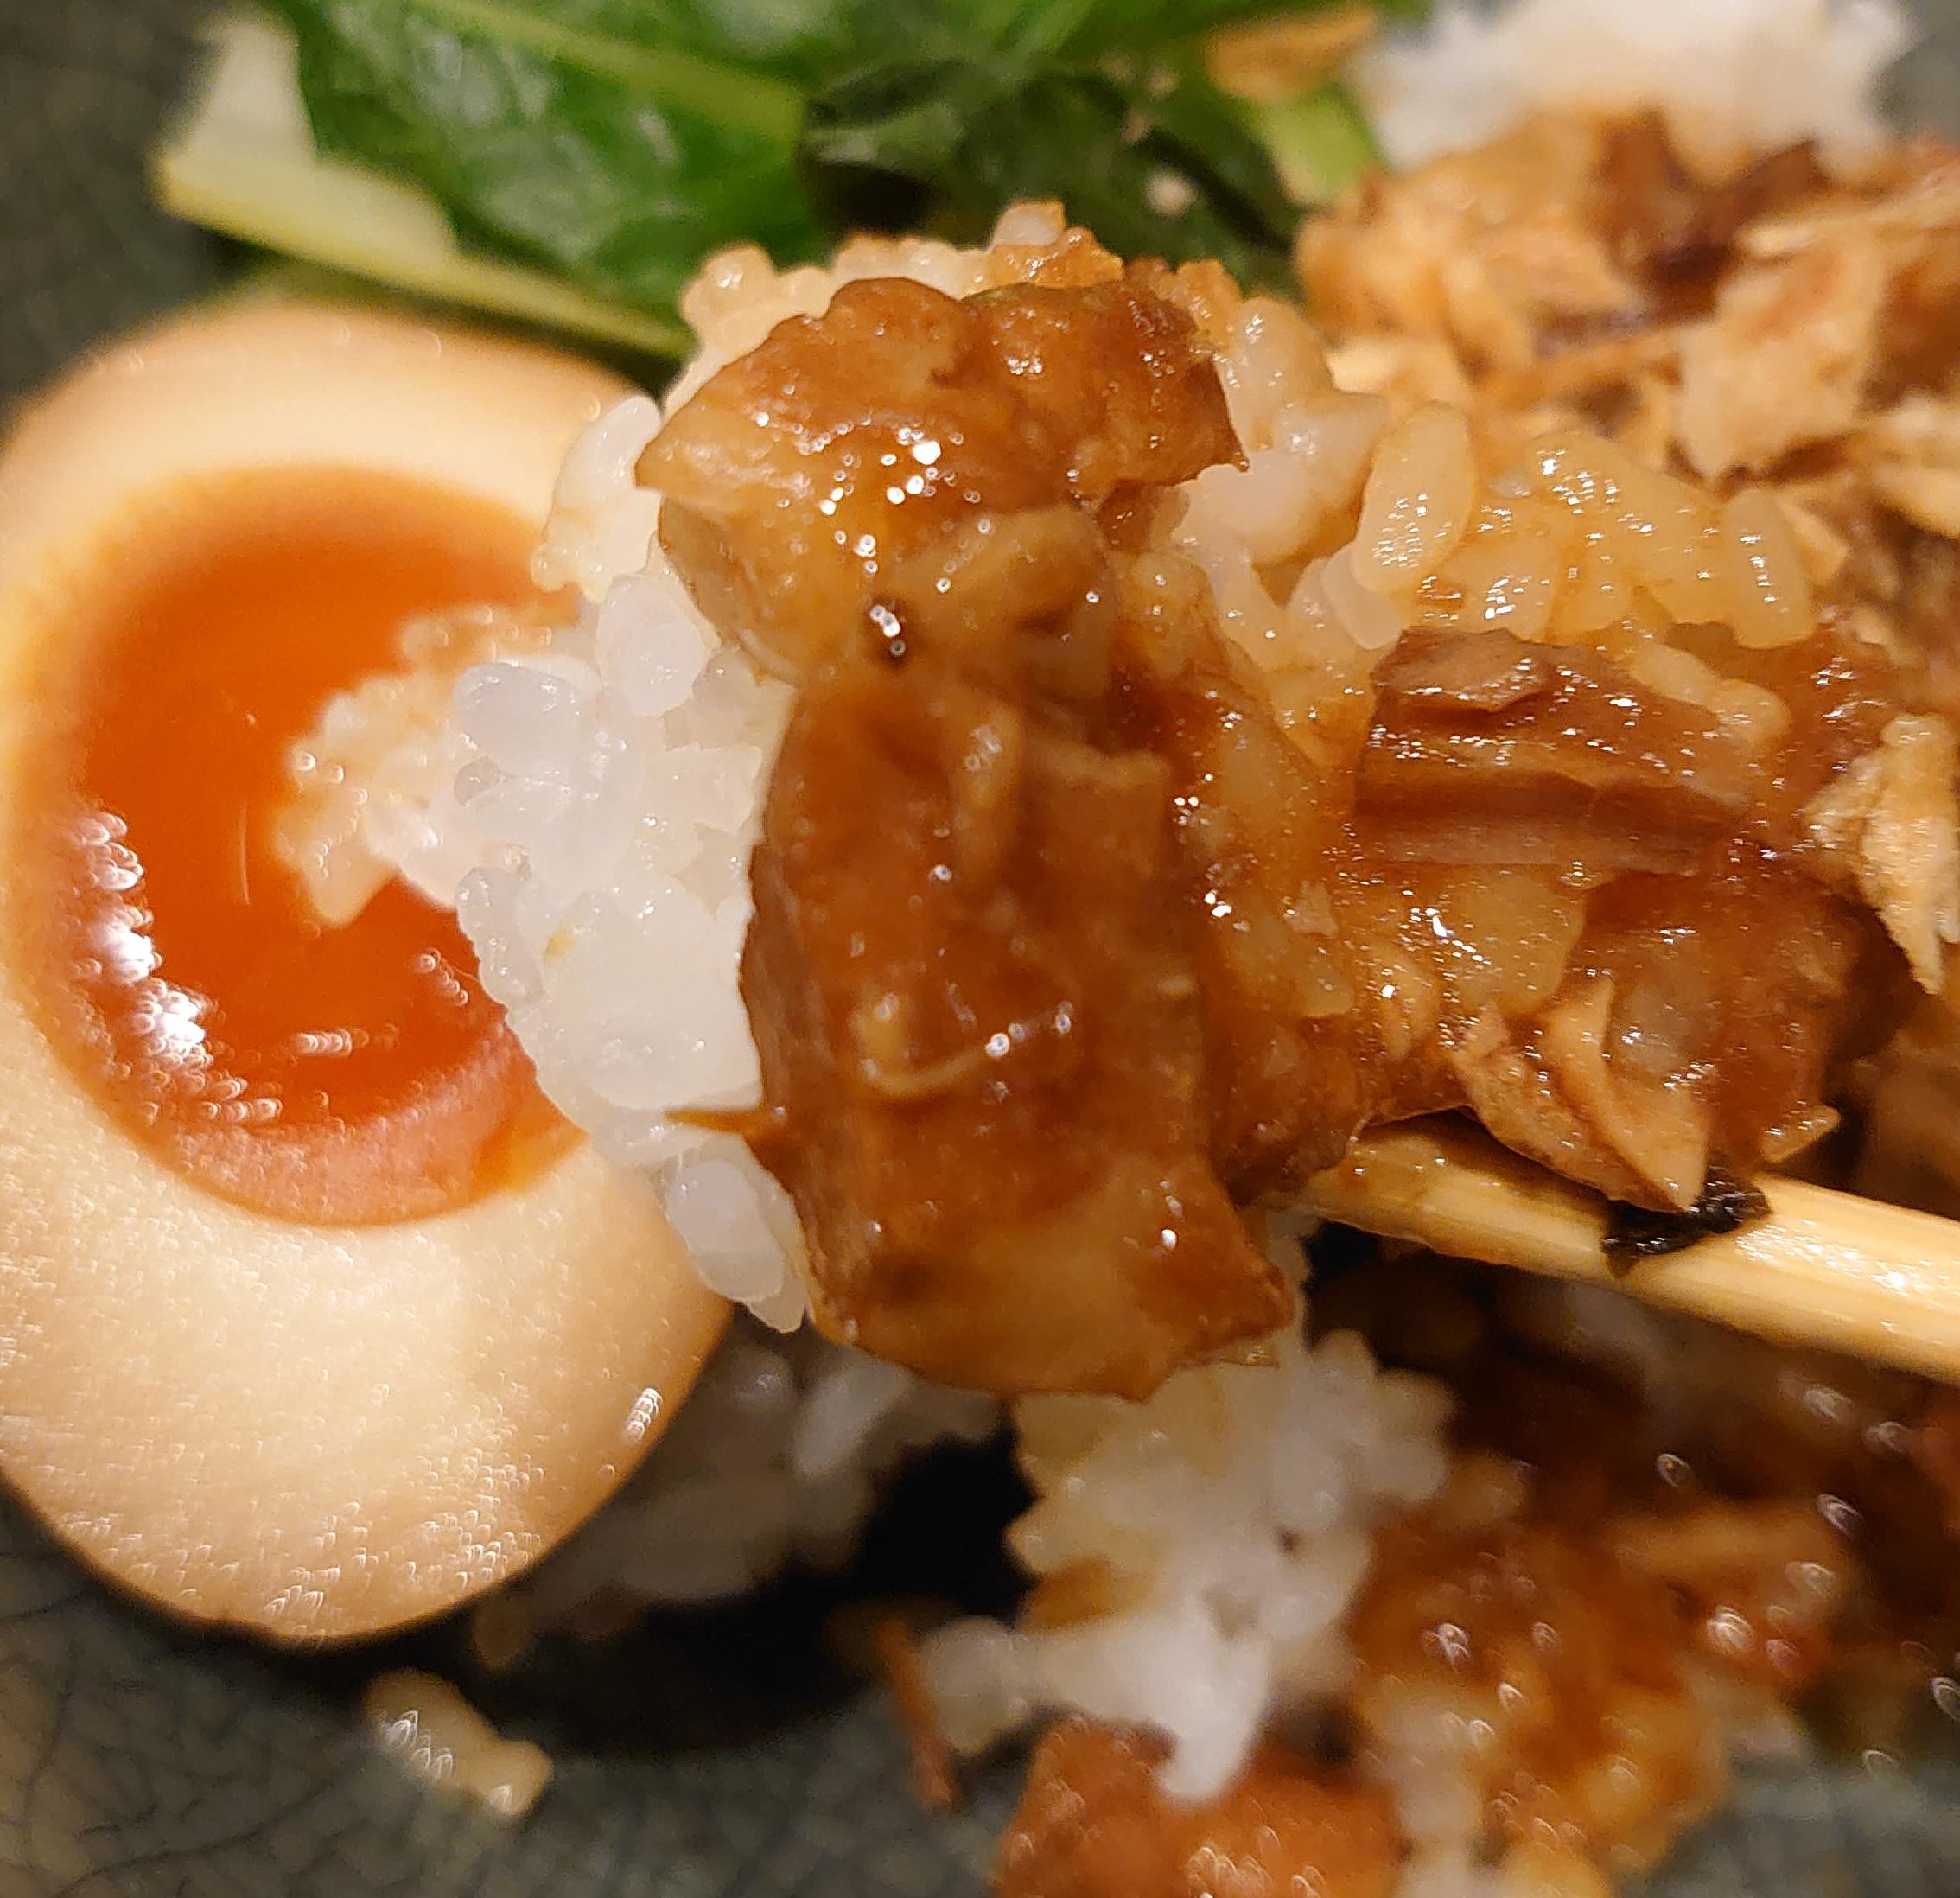 雲林坊 川口店 台湾ルーロー飯